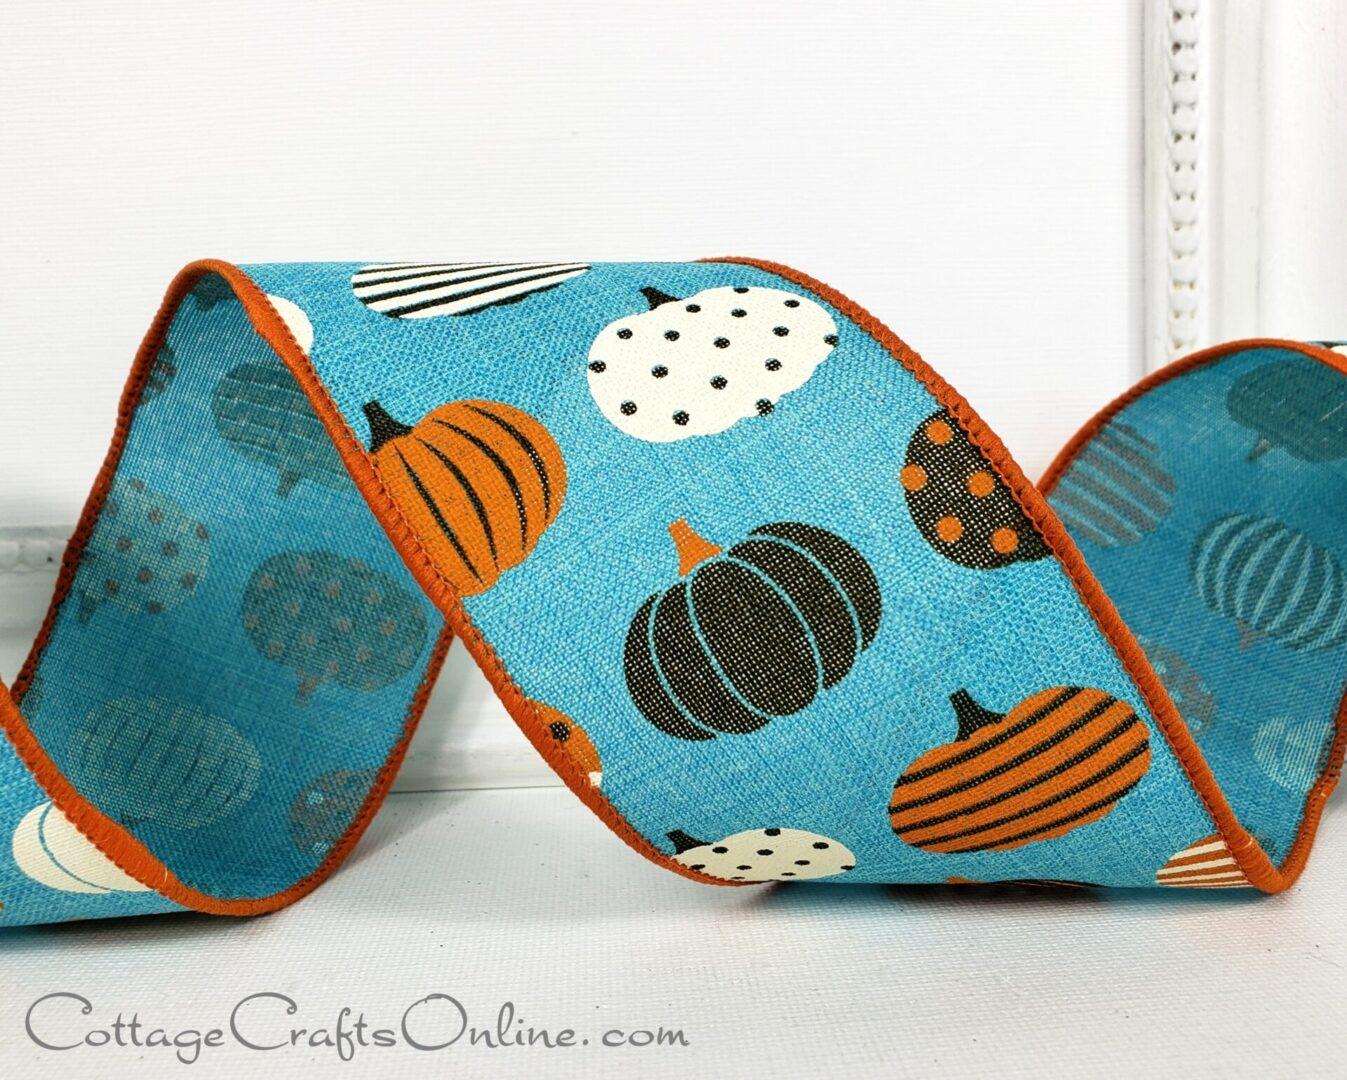 teal blue patterned pumpkins turquoise cb 40-011